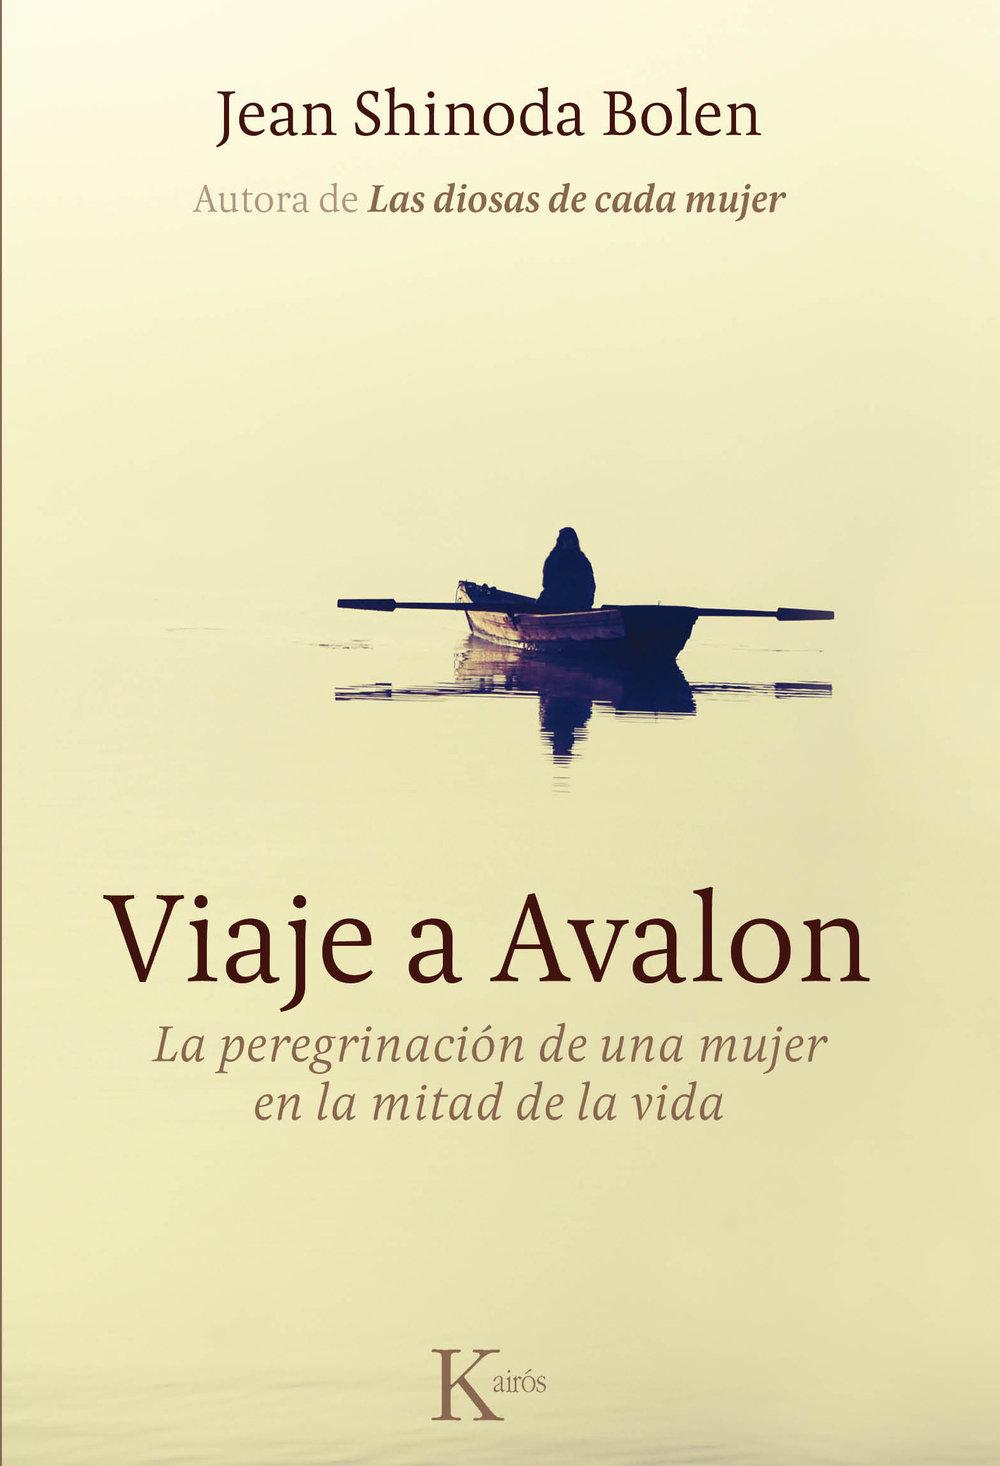 Viaje a Avalon Jean Shinoda Bolen.jpg